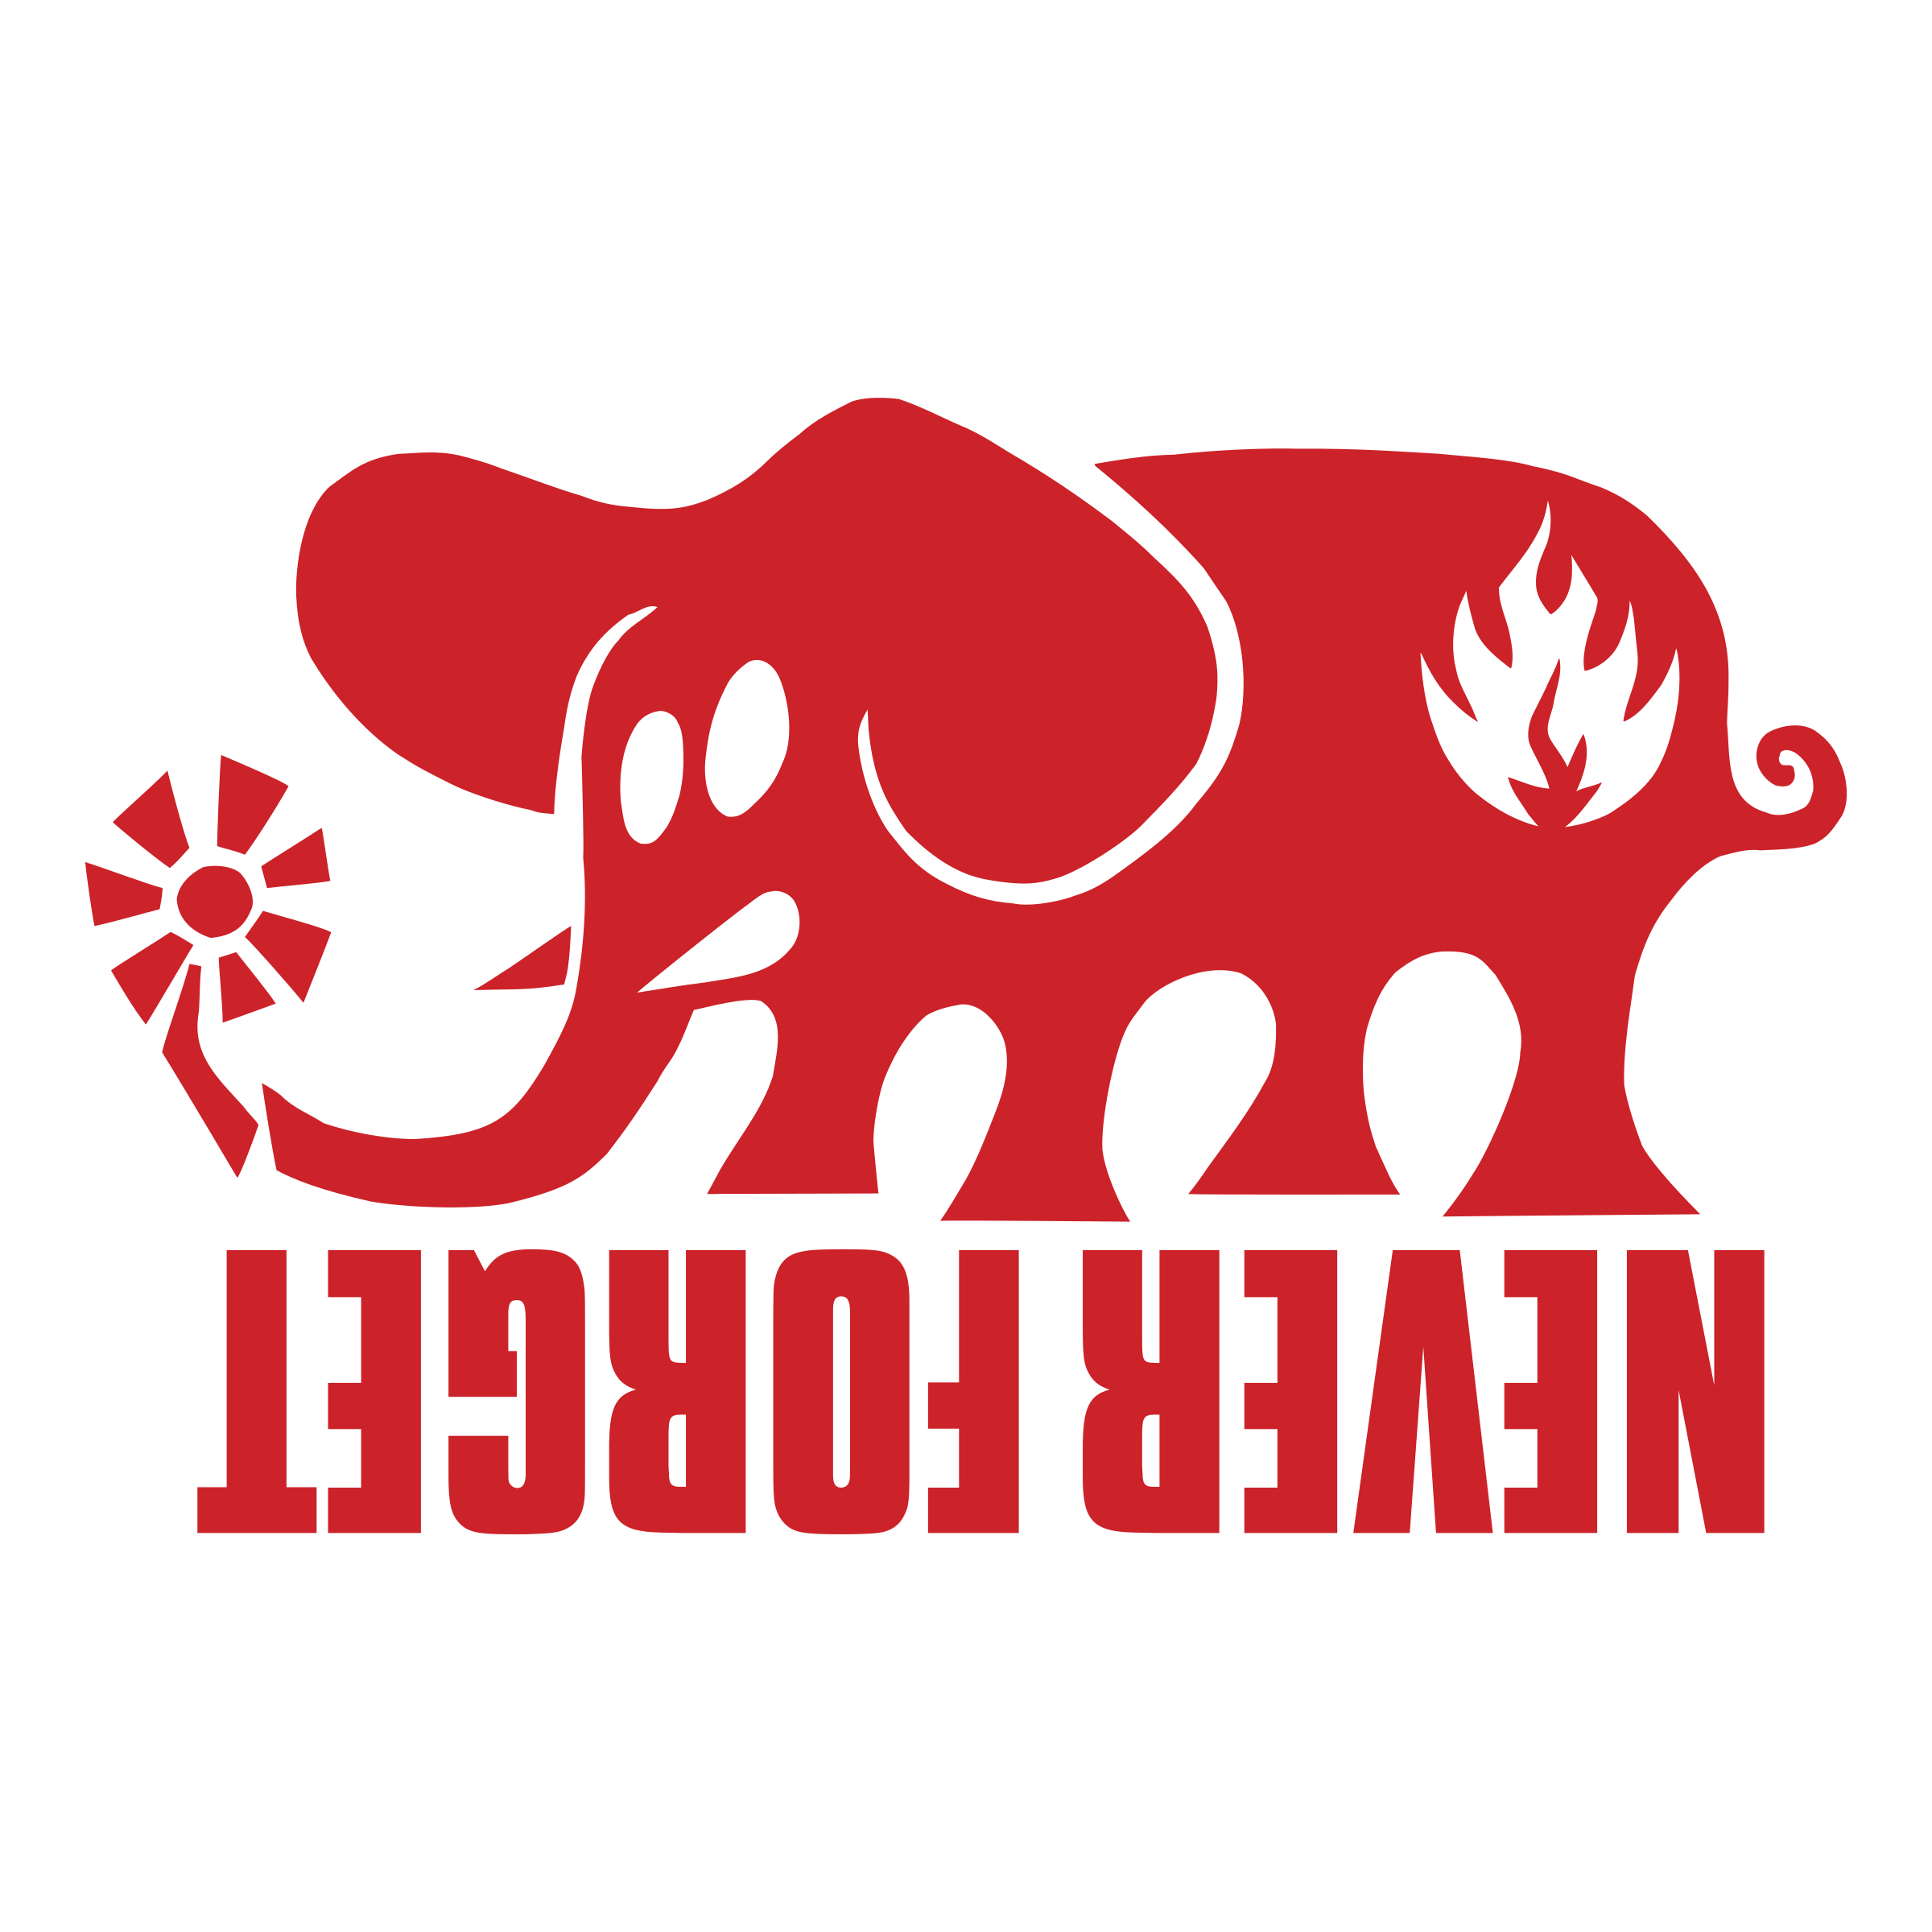 Download Elephant Logo Png Png Gif Base Download 131 elephant logo free vectors. download elephant logo png png gif base